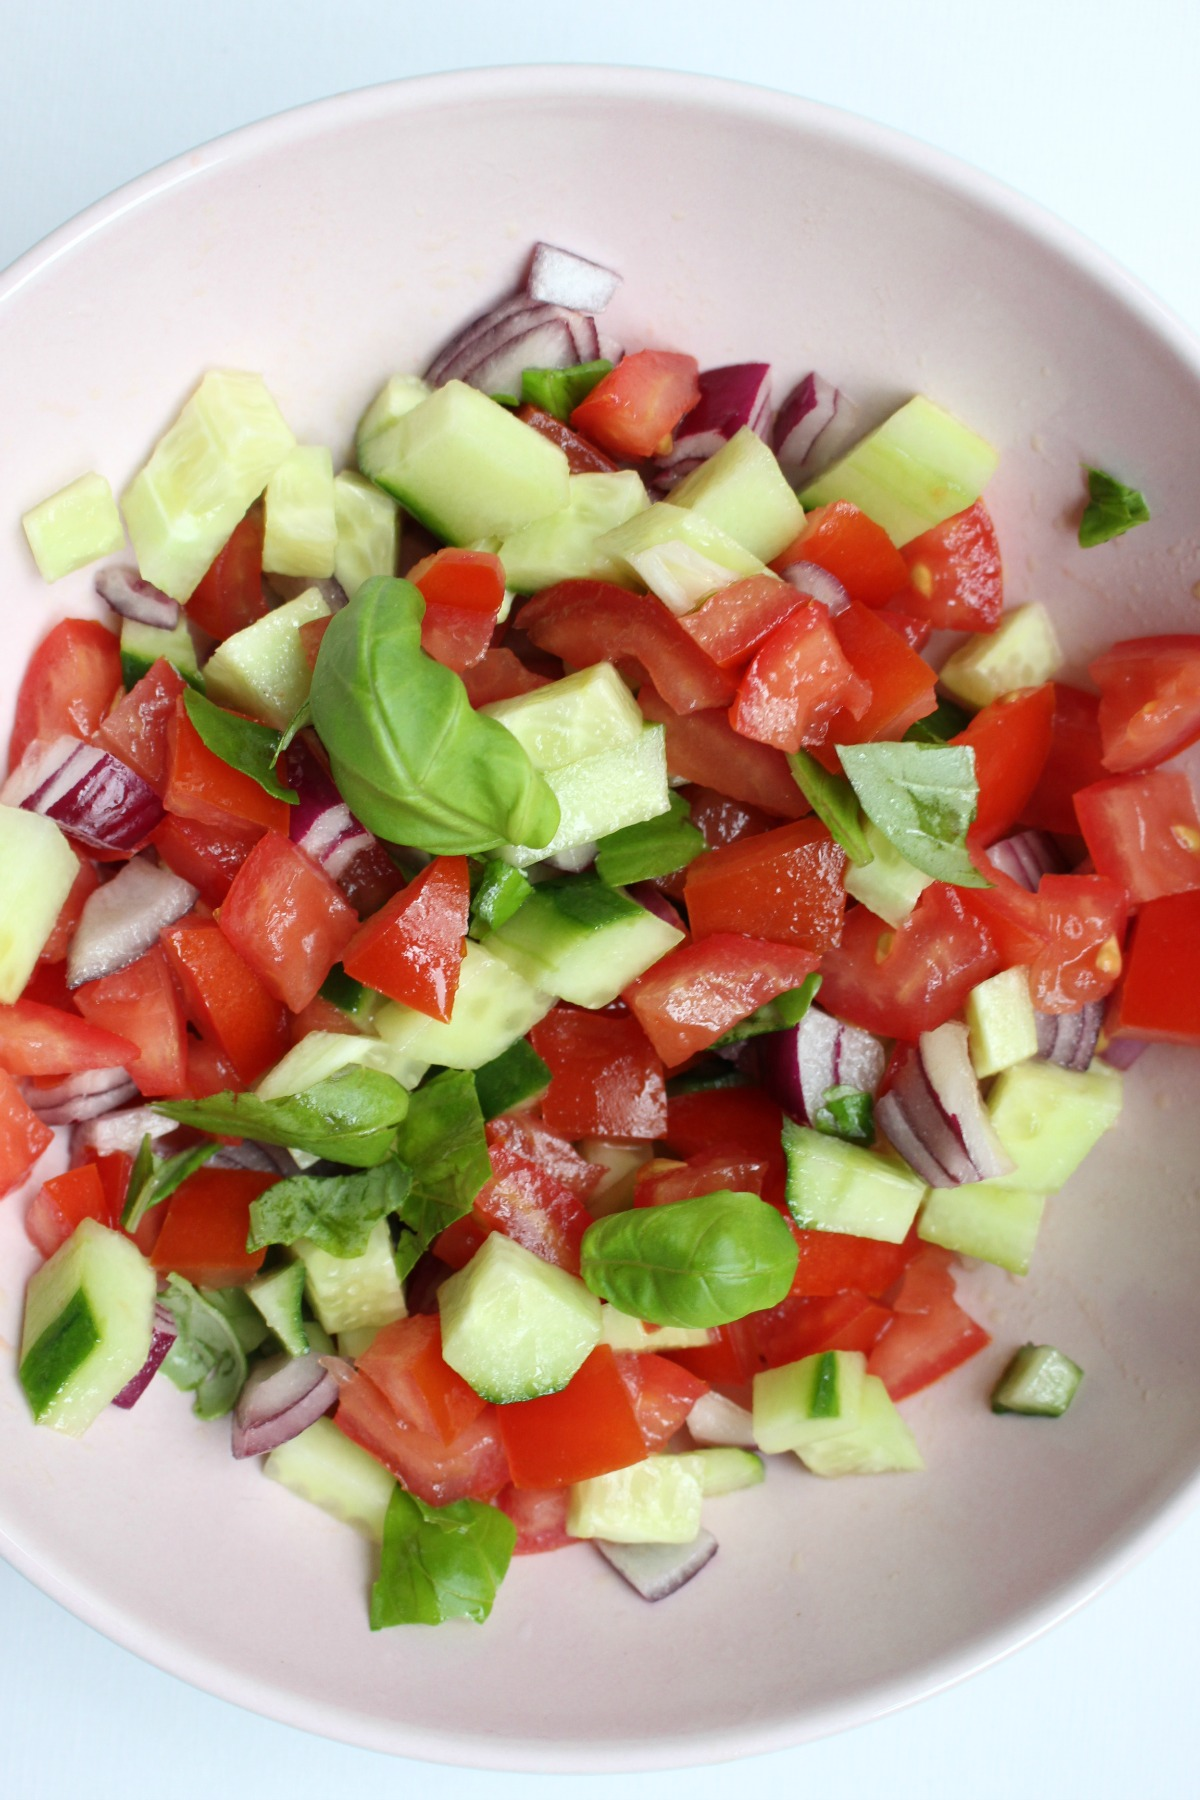 Zo gemaakte tomaten – komkommersalsa